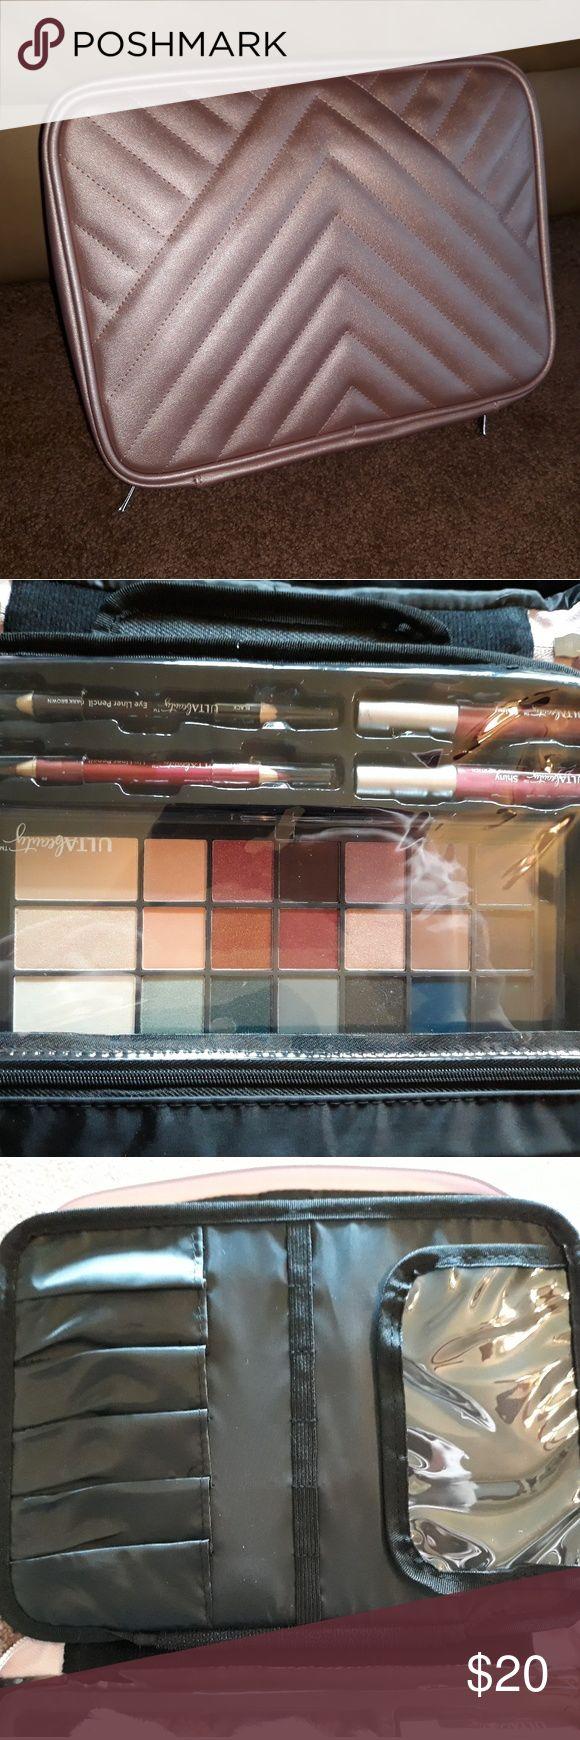 NWT 💄 Ulta makeup KIT! 💄 Ulta makeup, Makeup kit, Ulta